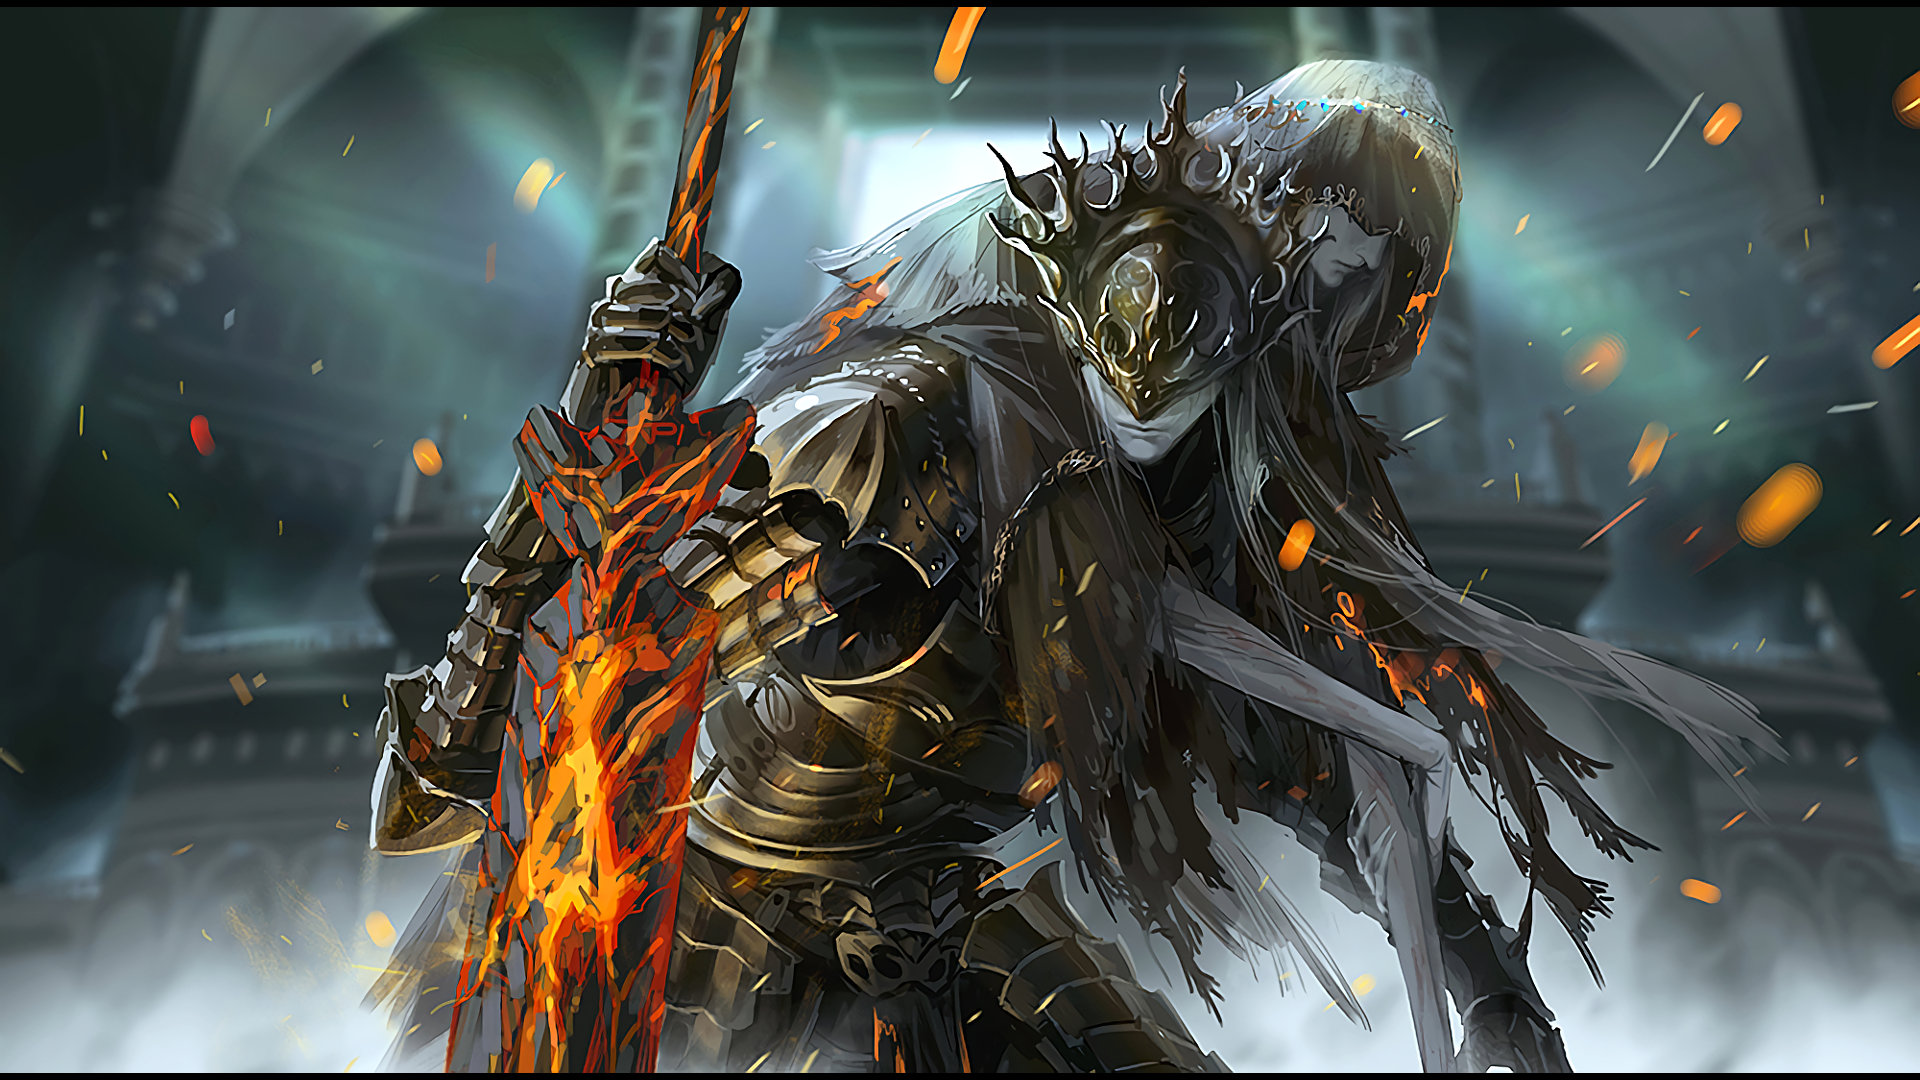 download di dark souls ps3 background :: reucentsibve gq